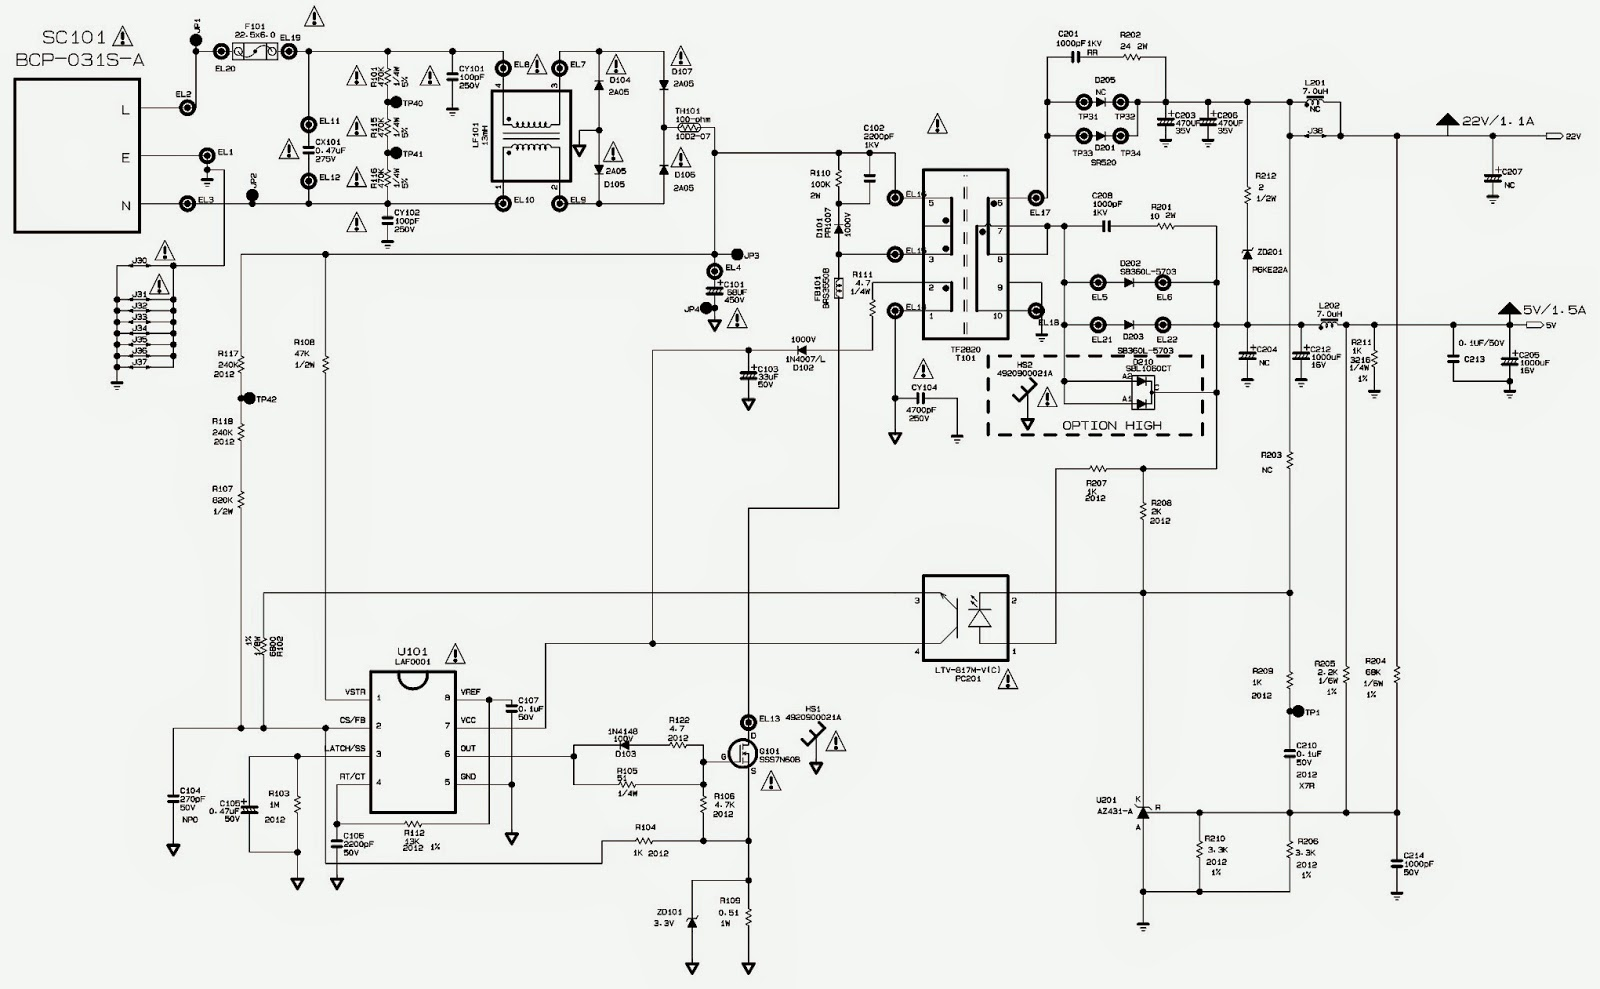 LG FLATRON W1942S LCD MONITOR AOCL32W831 PHILCO28T35DG